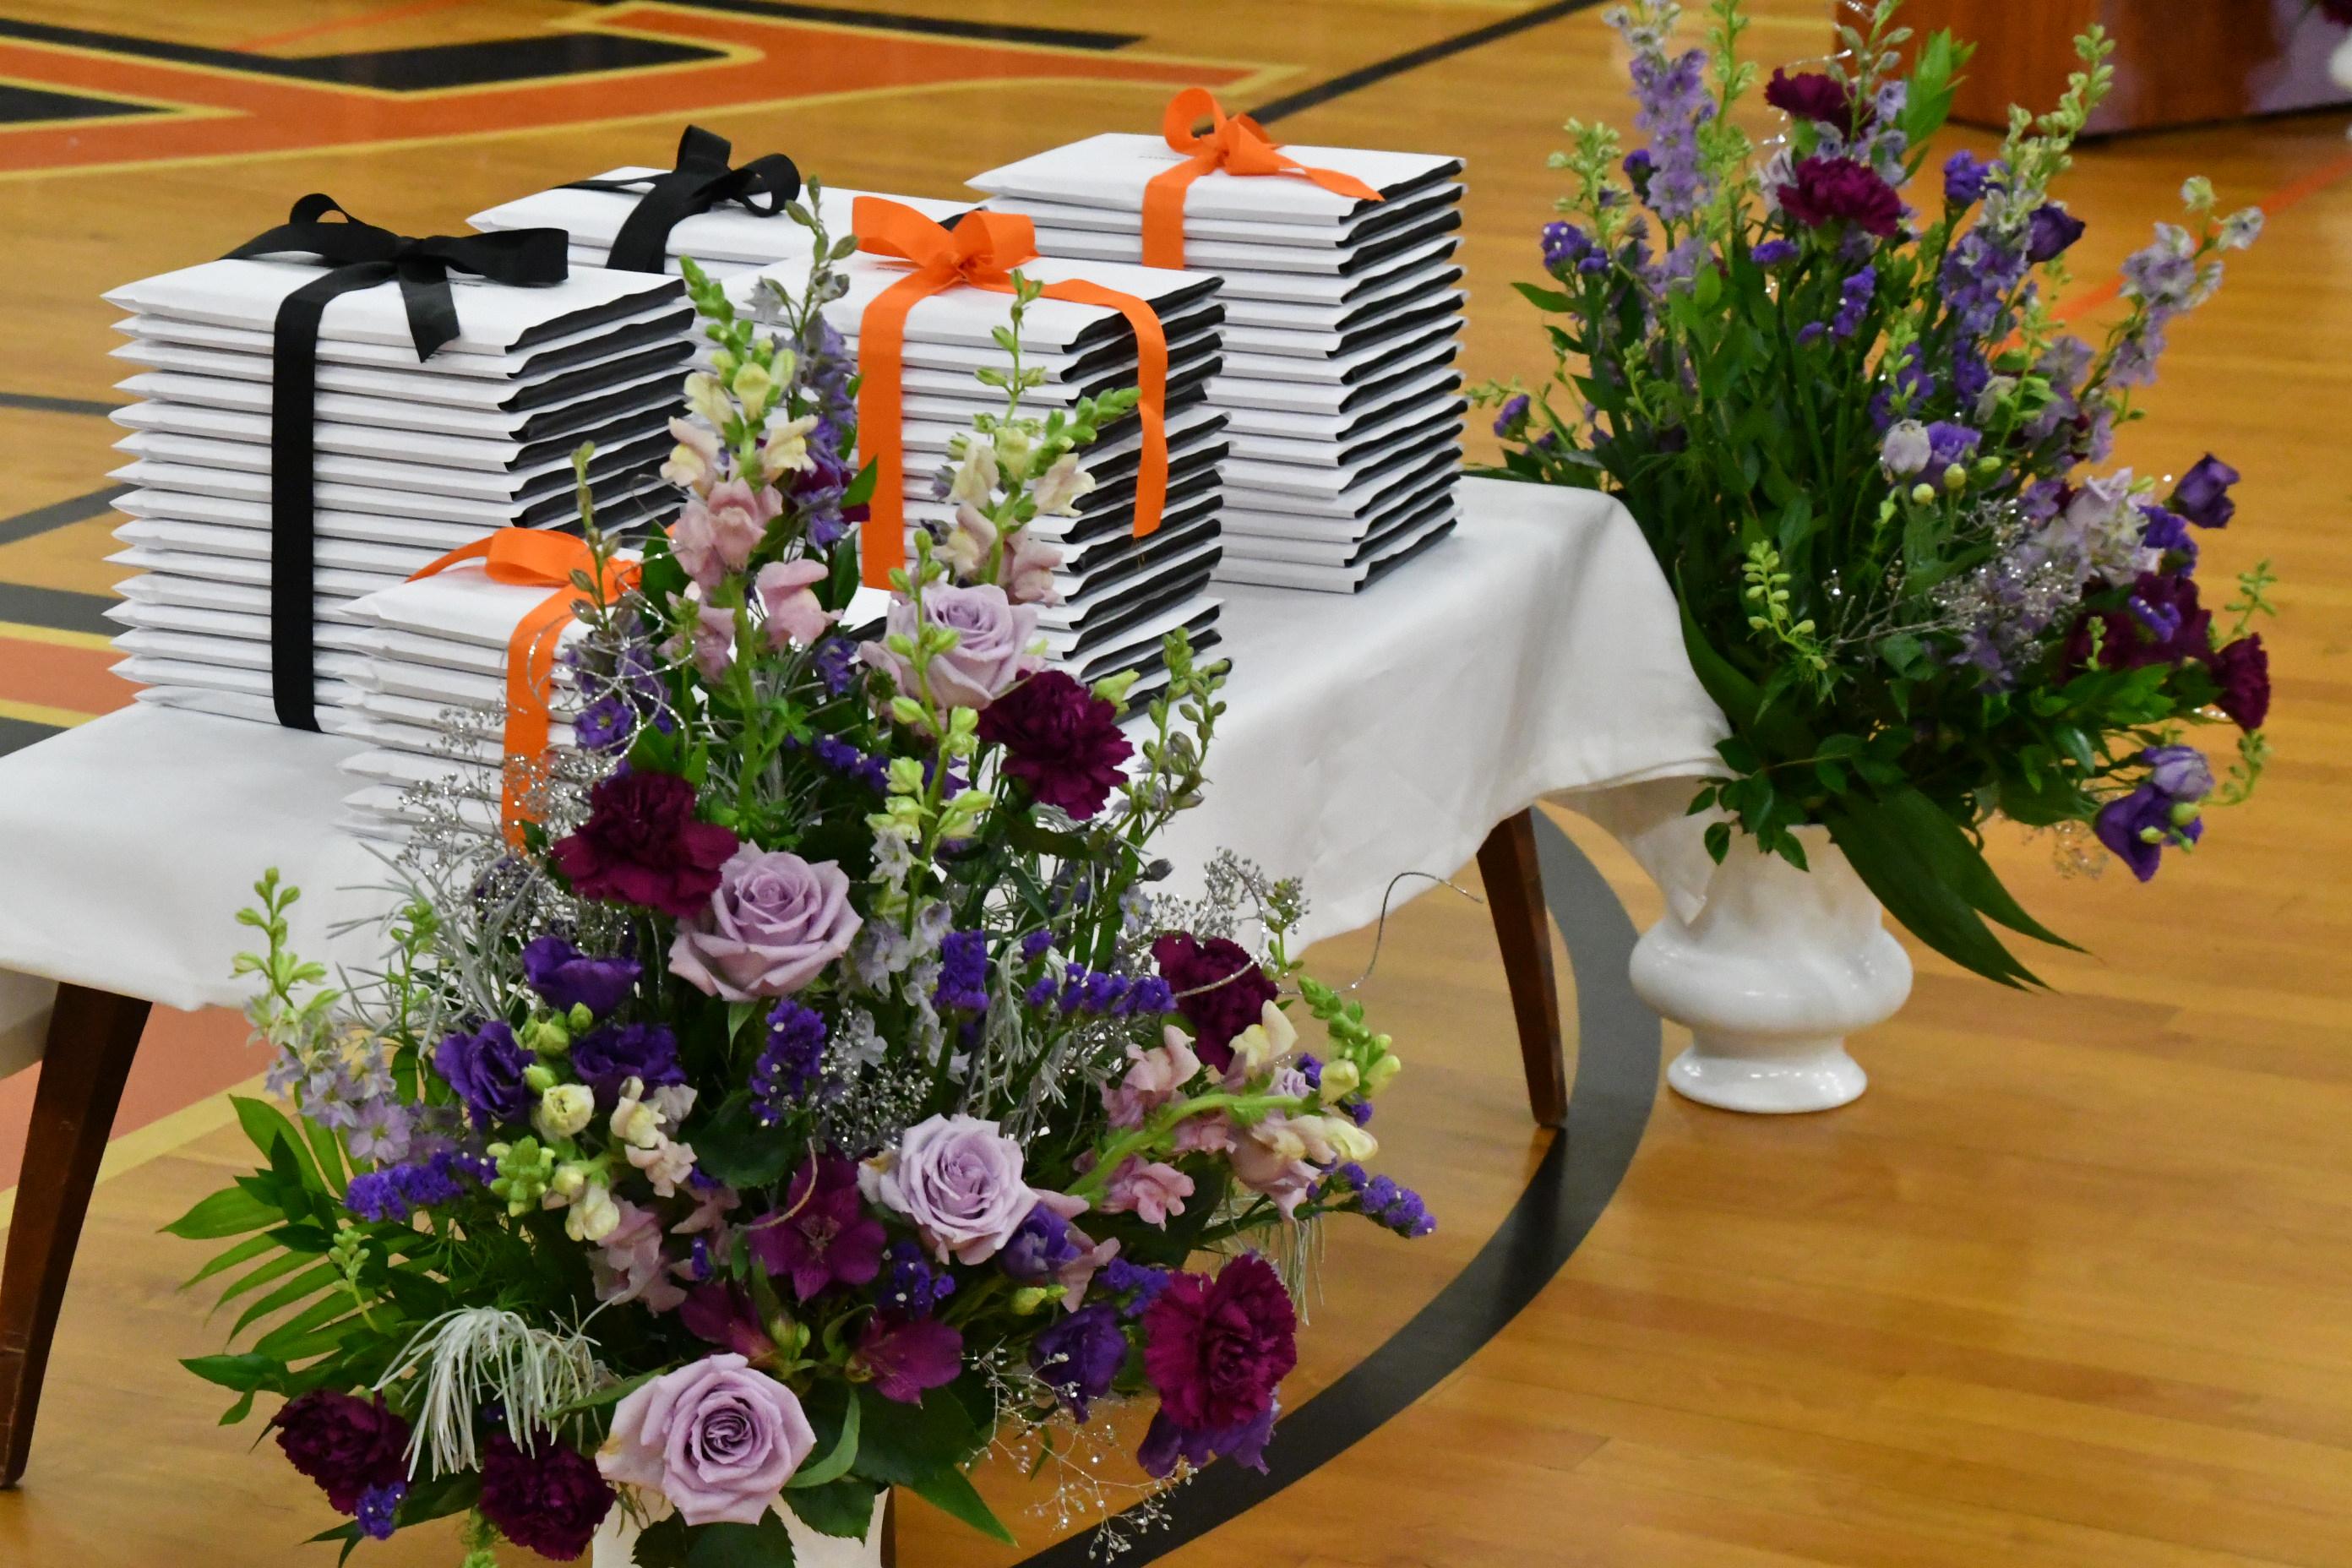 upper dauphin area graduation diplomas